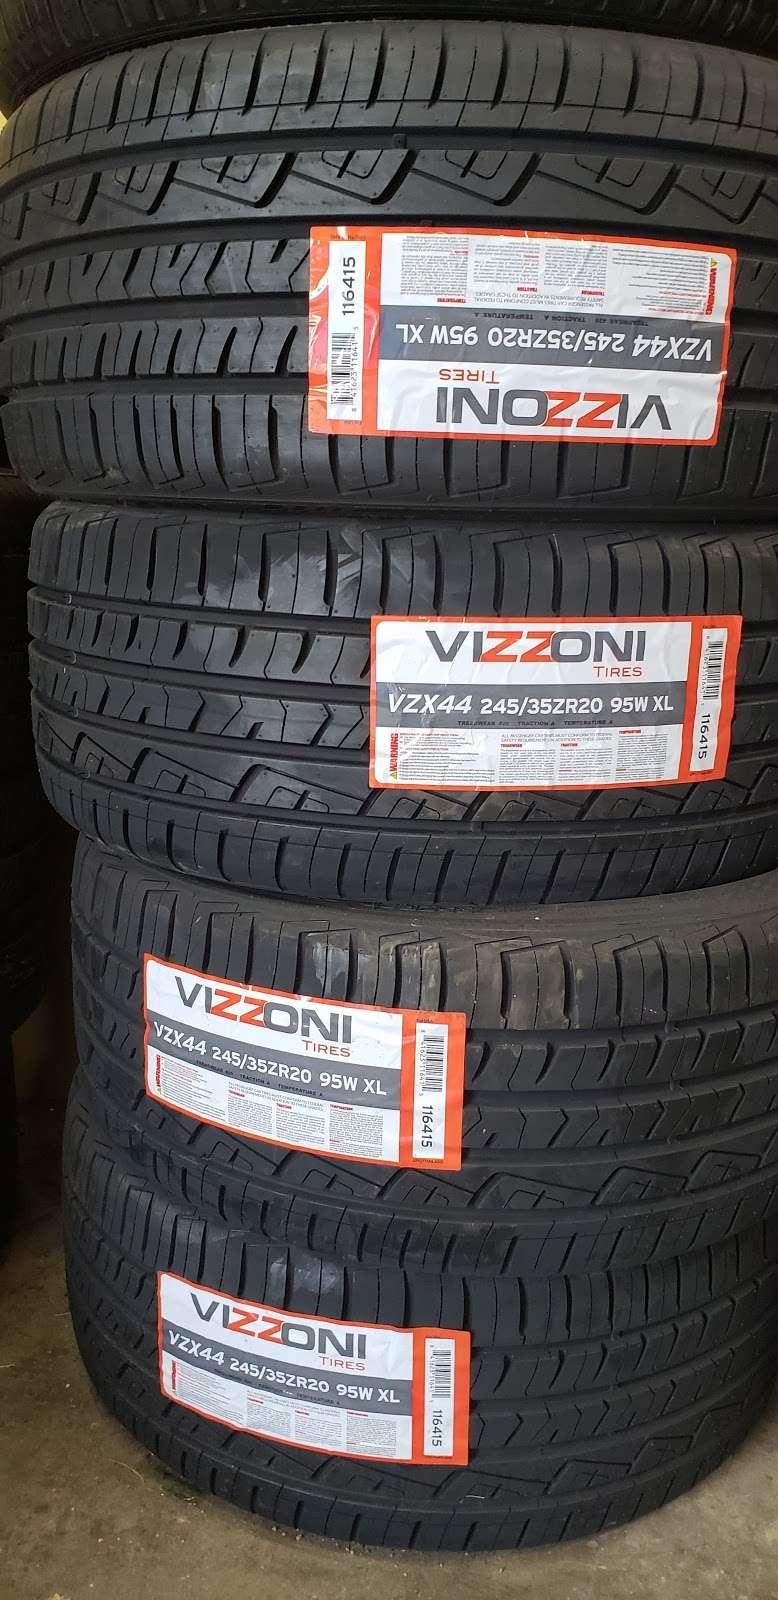 Sierra's Tire Shop - car repair  | Photo 6 of 10 | Address: 8105 Bayway Dr, Baytown, TX 77520, USA | Phone: (346) 265-1754